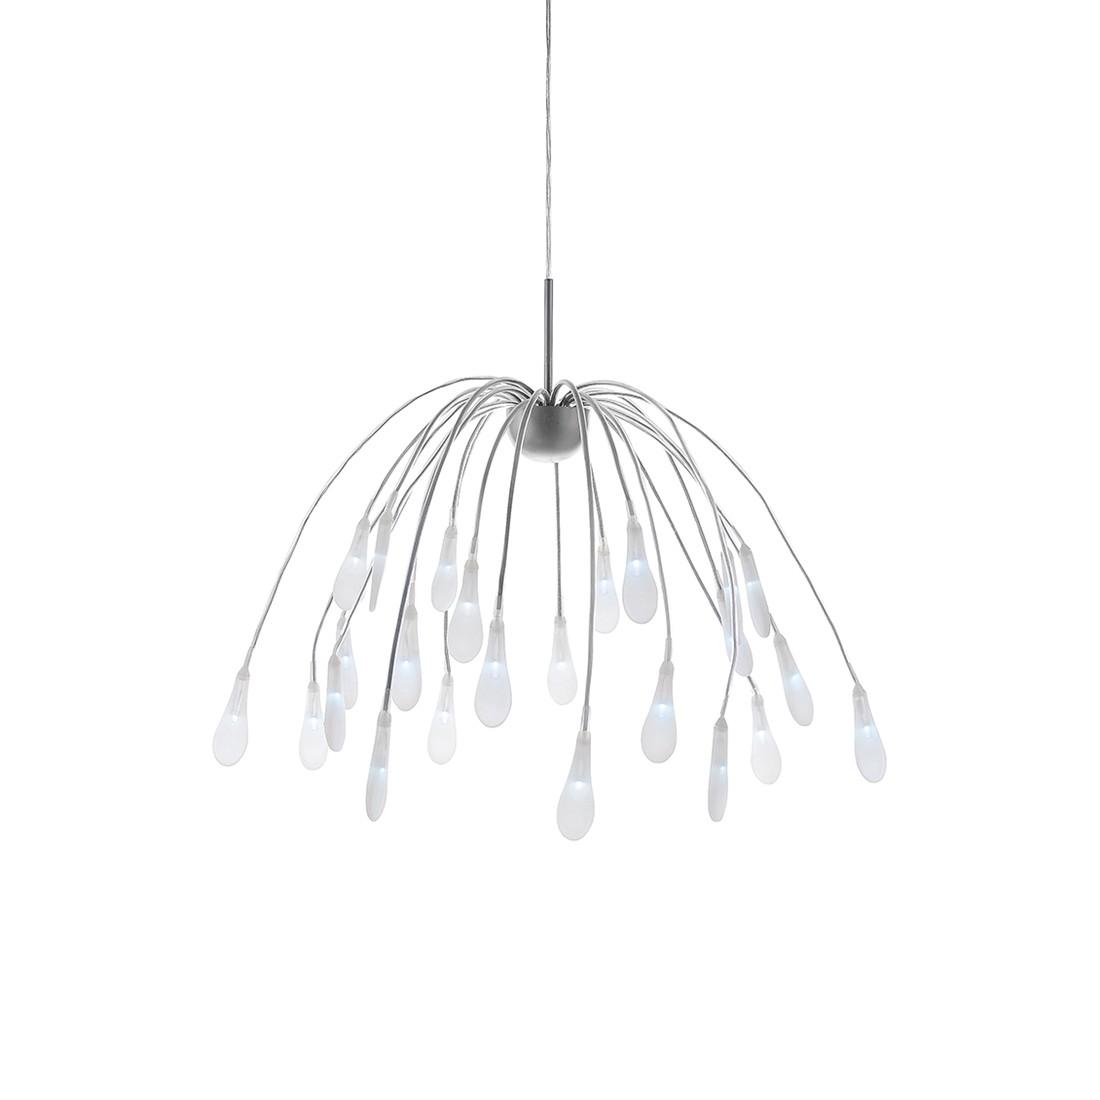 energie  A+, Hanglamp Akuma by Leuchten Direkt - ijzer/kunststof zilverkleurig 24 lichtbronnen, Leuchten Direkt